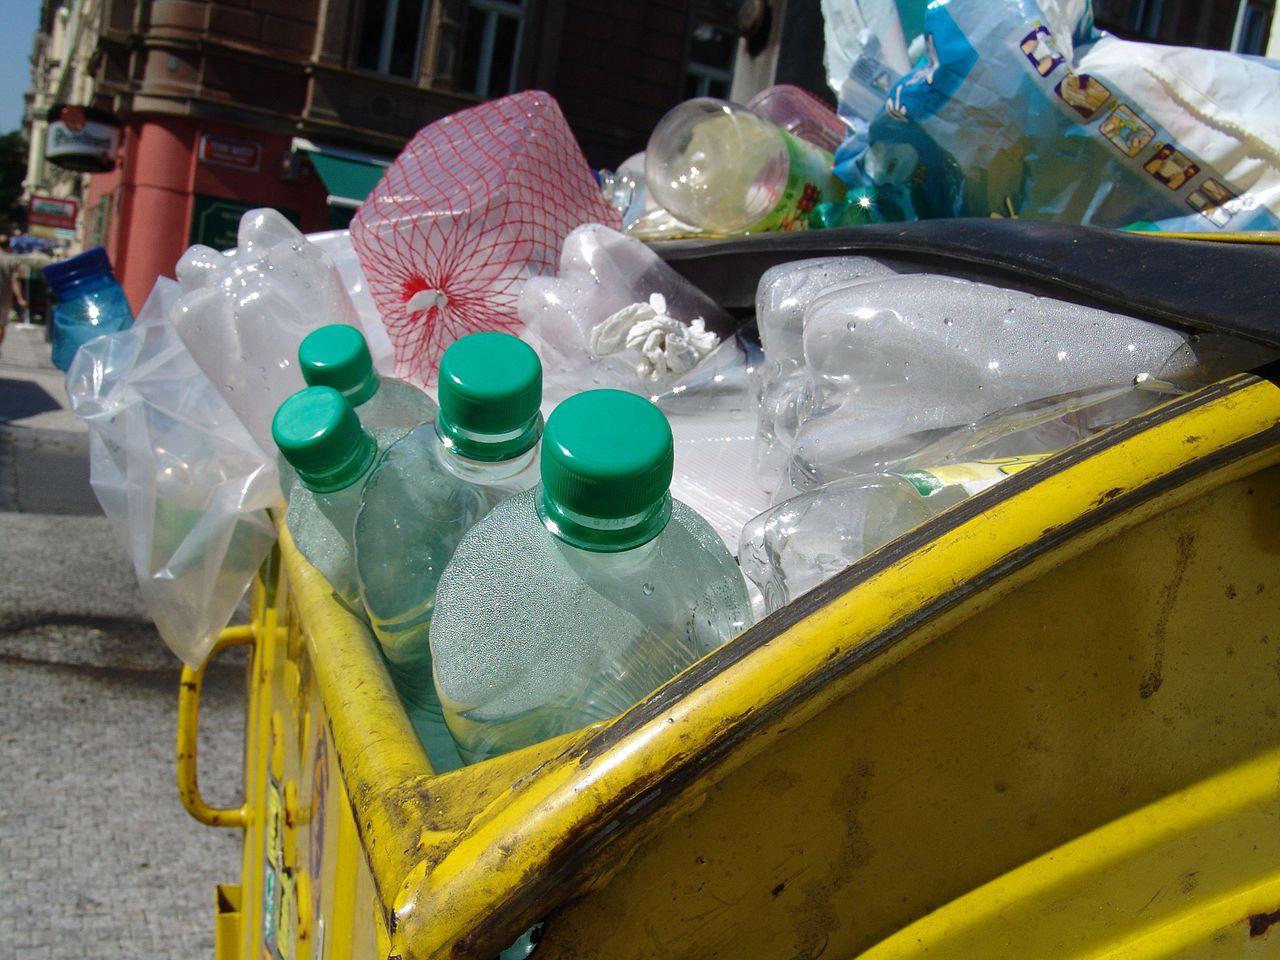 Empaques biodegradables hechos de avena